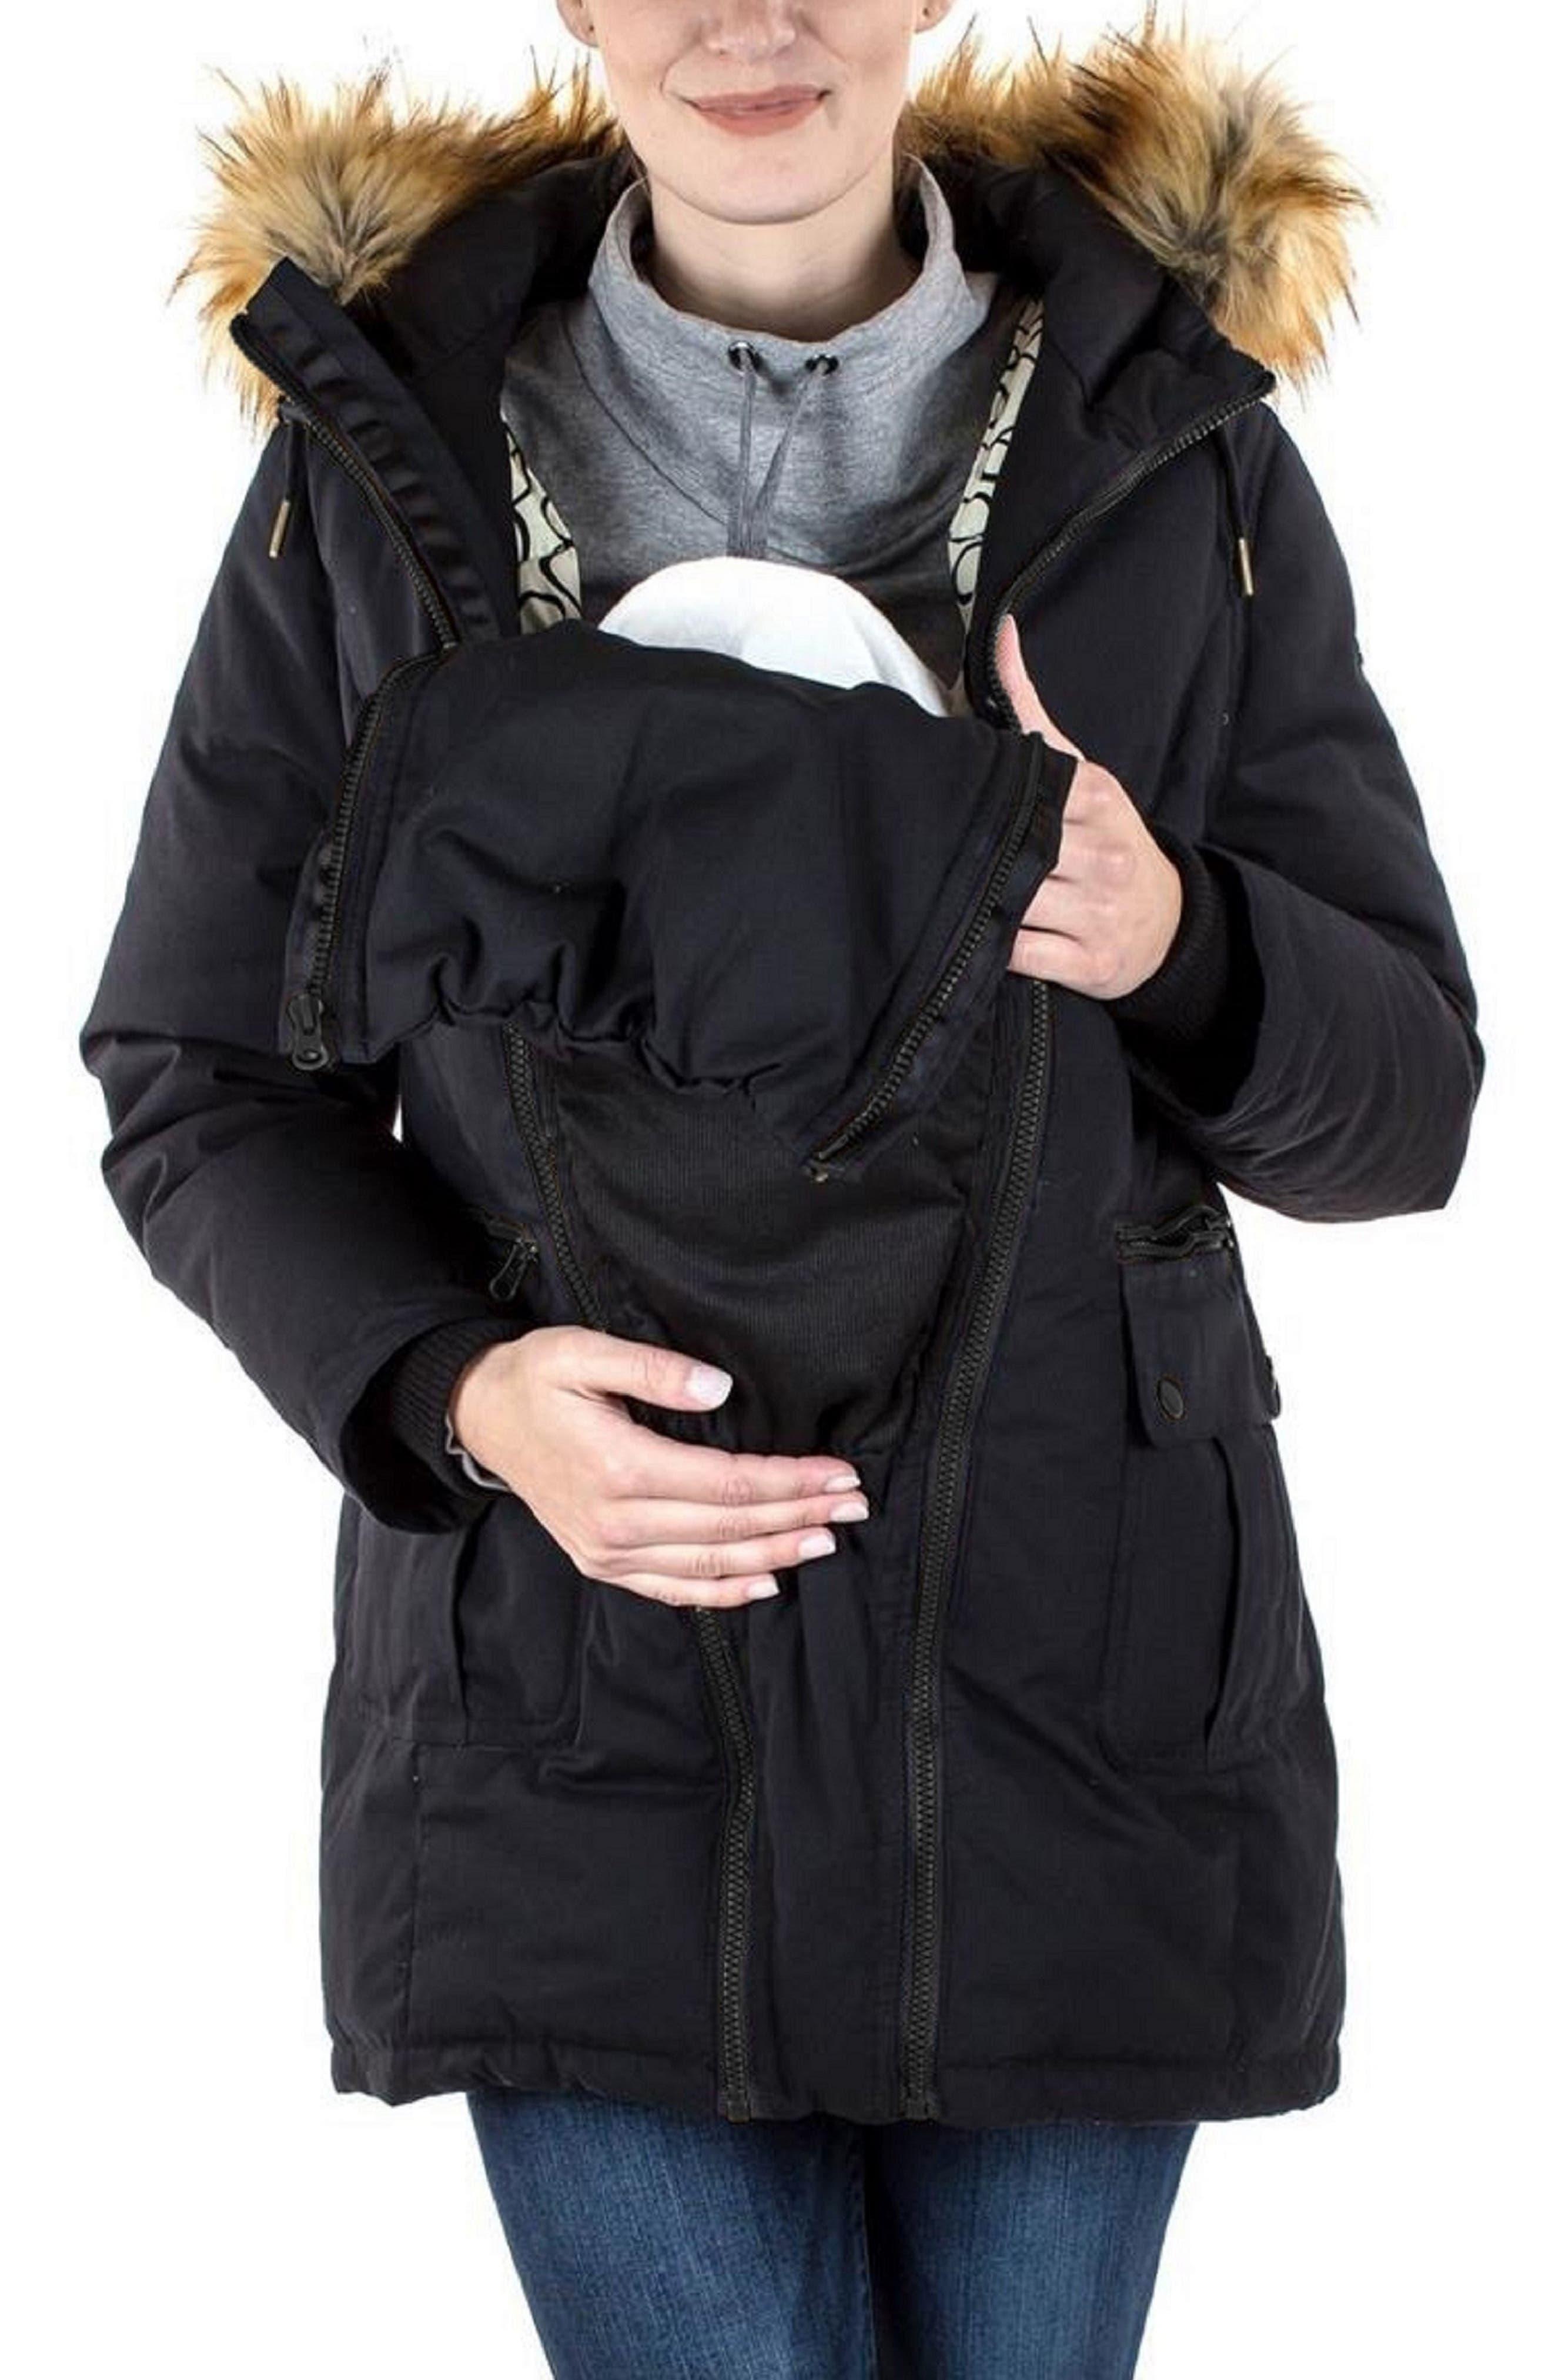 MODERN ETERNITY, Convertible Down 3-in-1 Maternity Jacket, Alternate thumbnail 2, color, BLACK